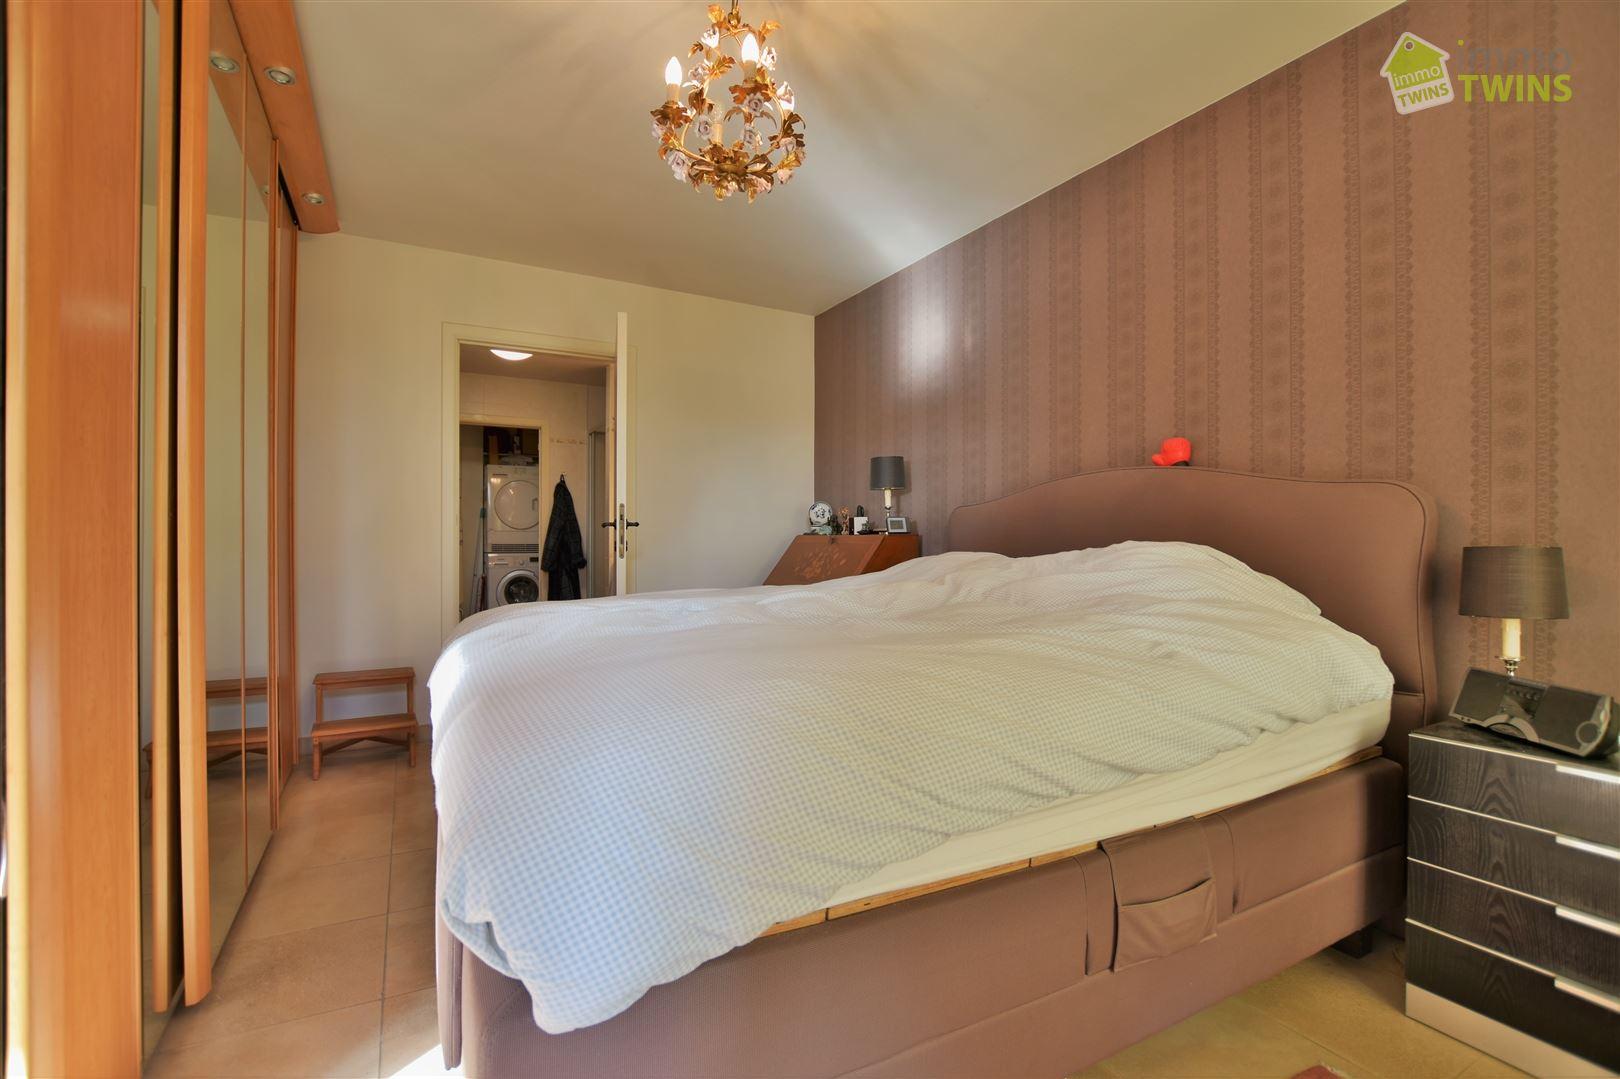 Foto 18 : Duplex/triplex te 9200 Dendermonde (België) - Prijs € 398.000